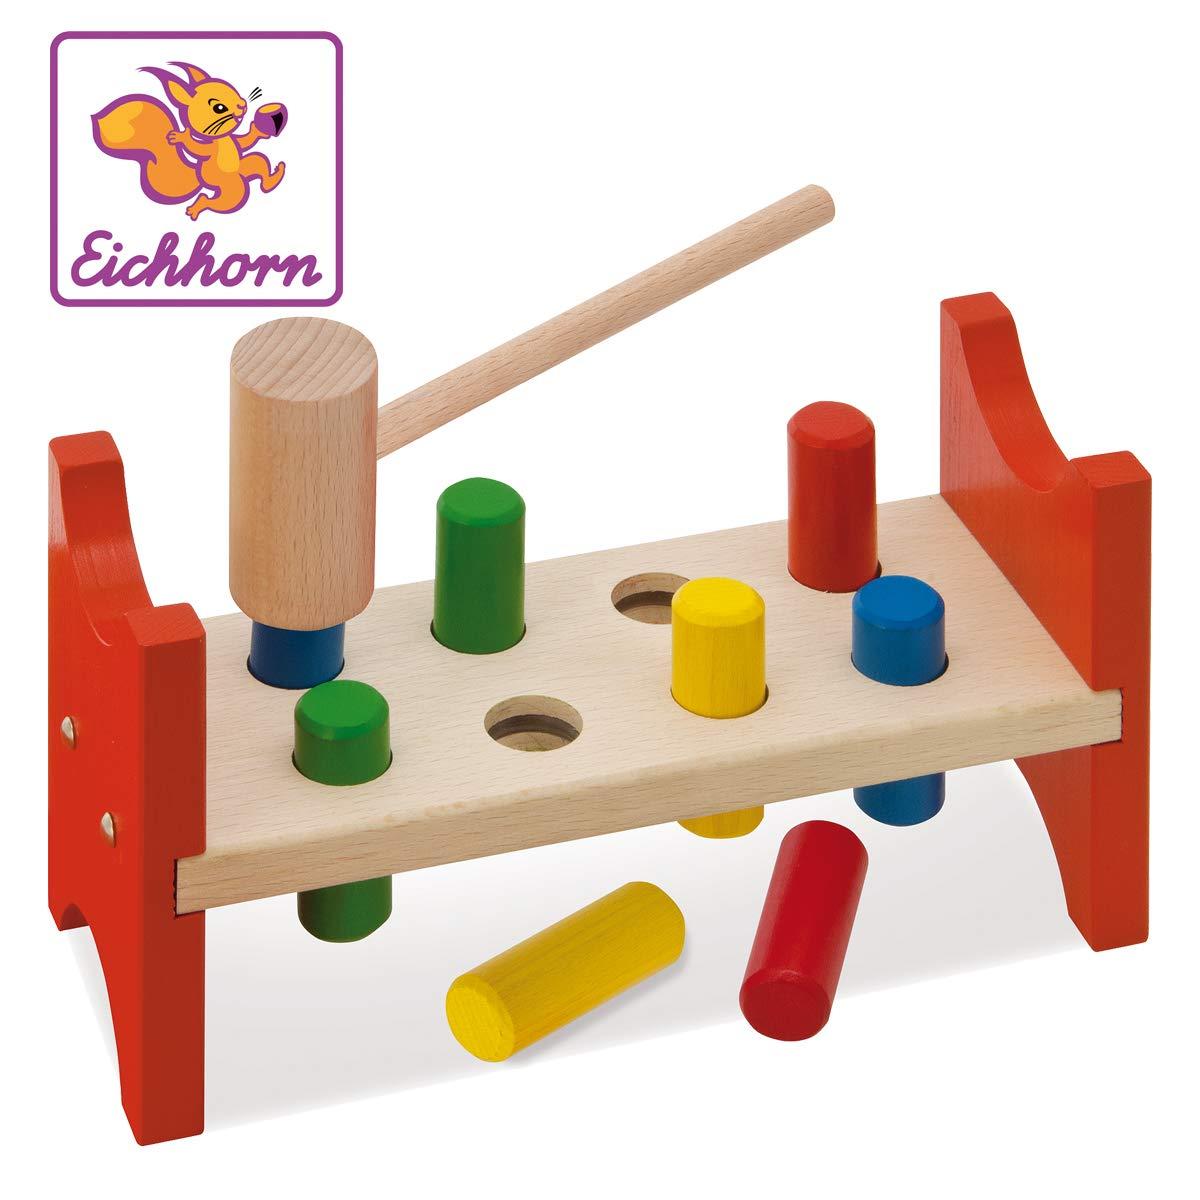 Juguetes Estimulacion Temprana 1 Ano.Juguetes Educativos Para Ninos De 1 A 2 Anos Guia 2020